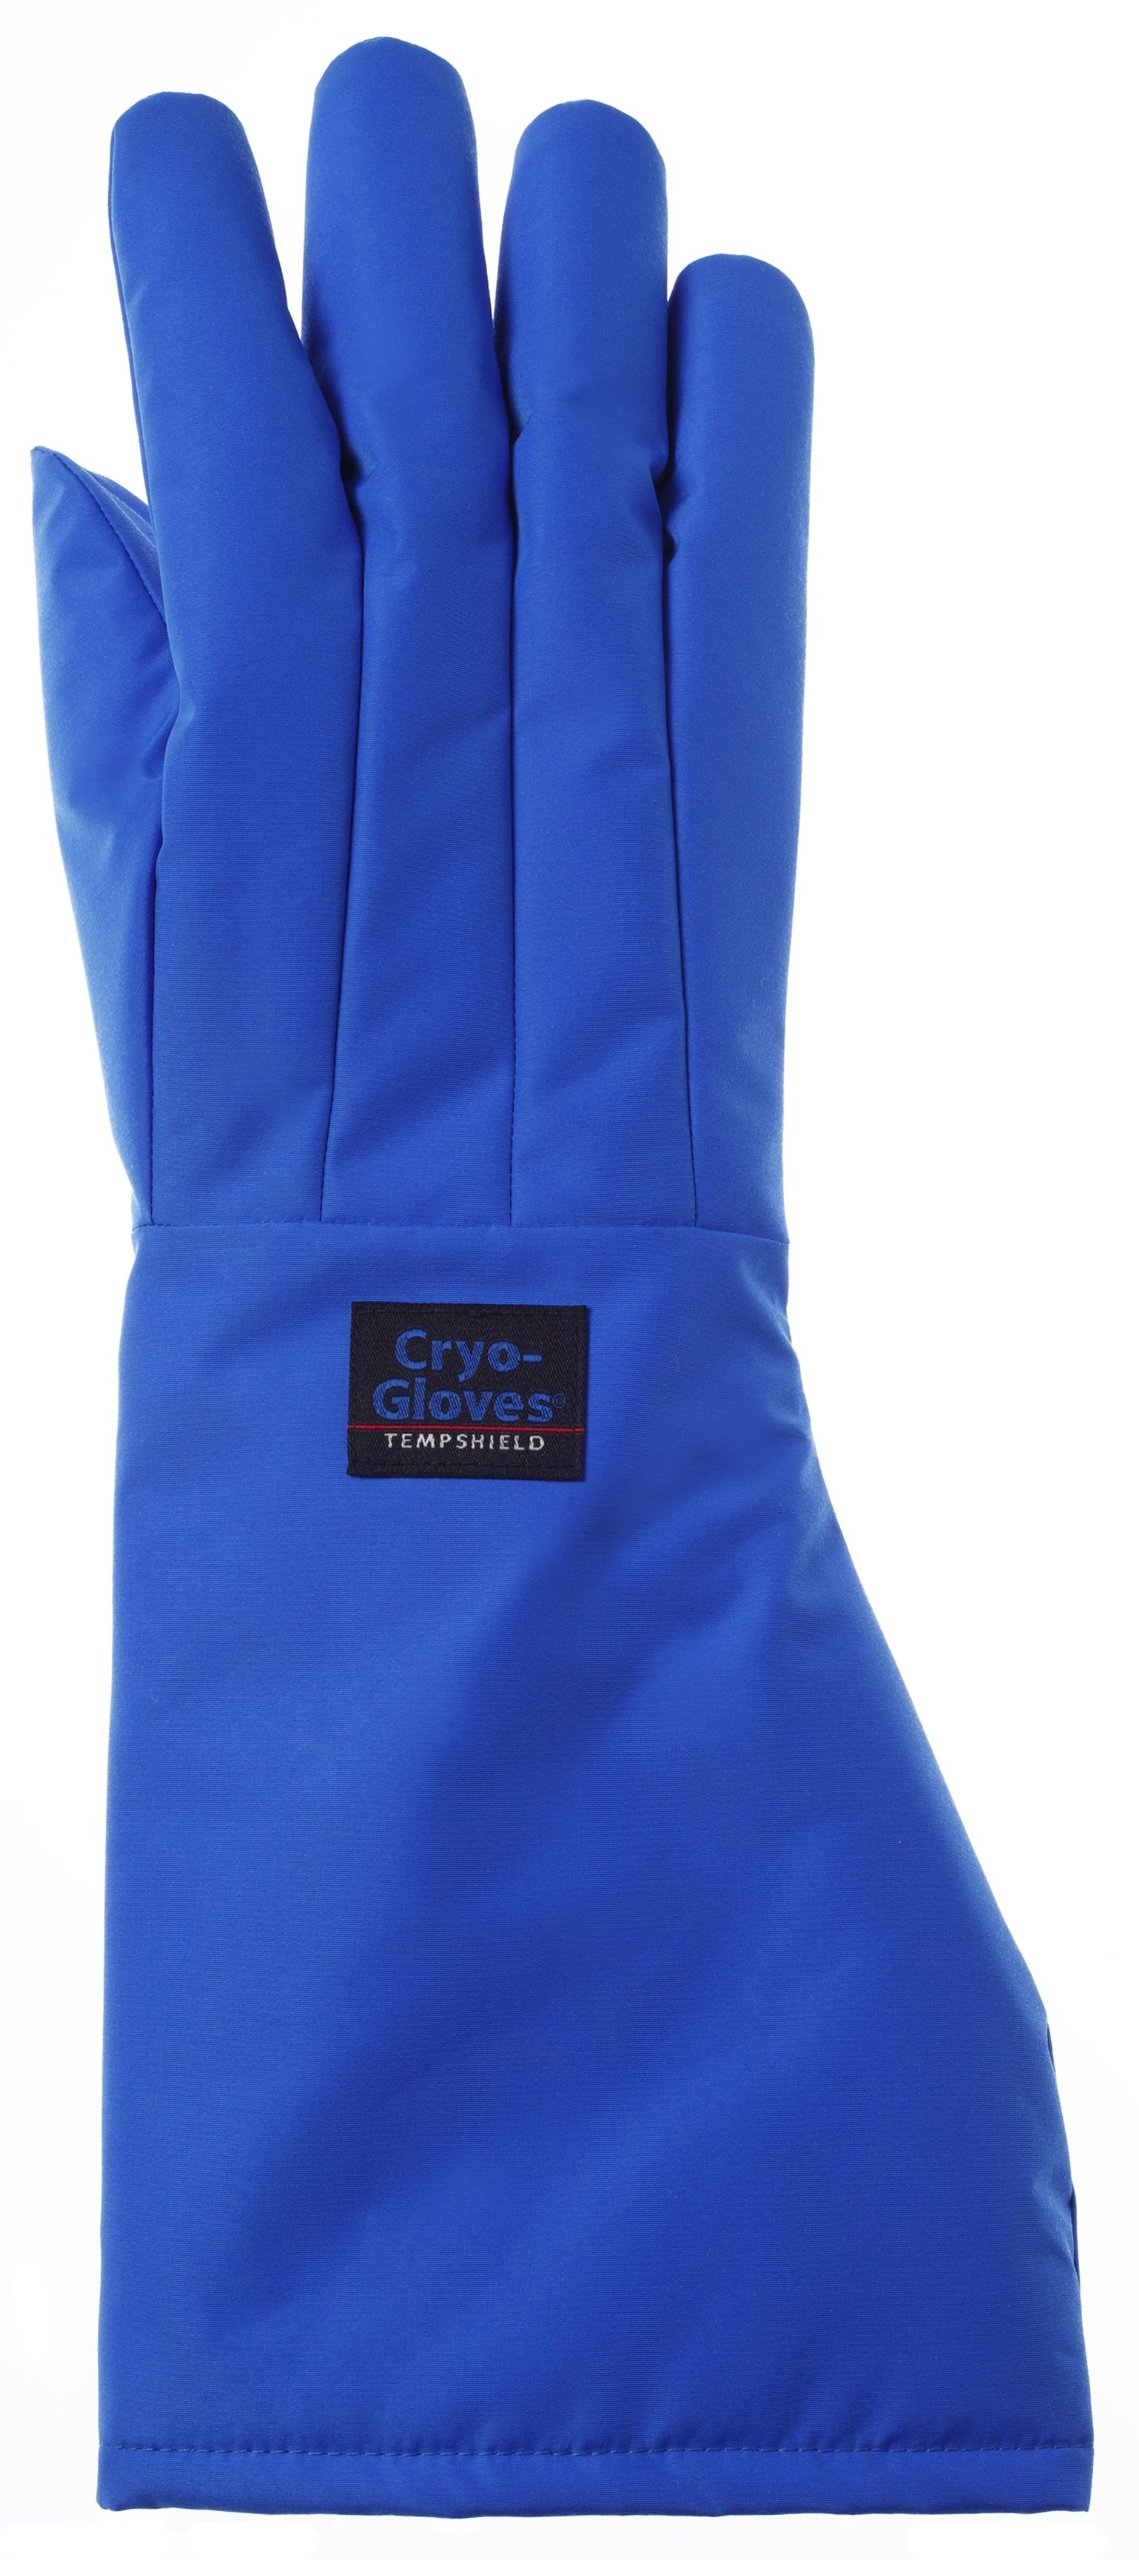 Cryo-Gloves EBM Cryogenic Gloves, Elbow Length Length, Medium